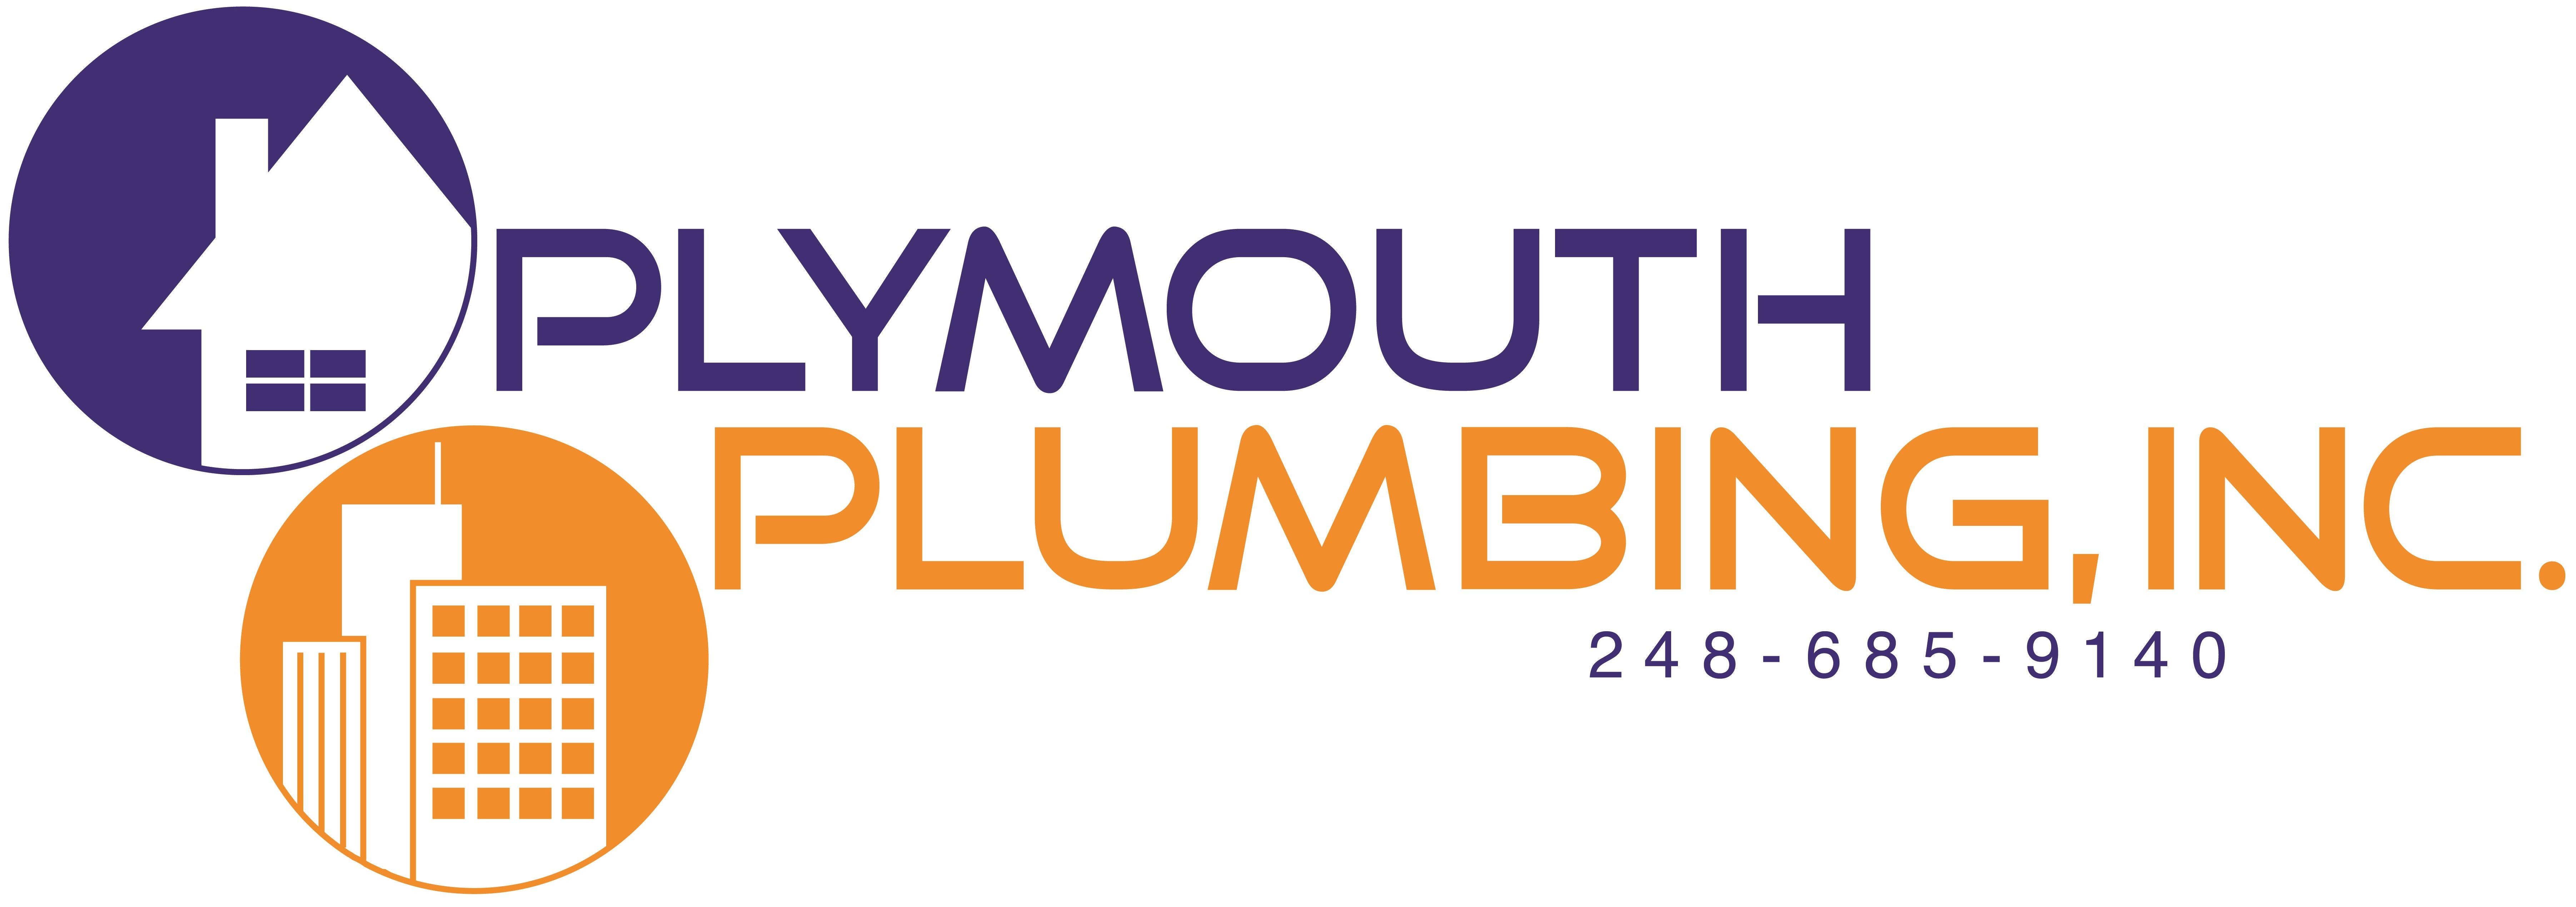 Plymouth Plumbing